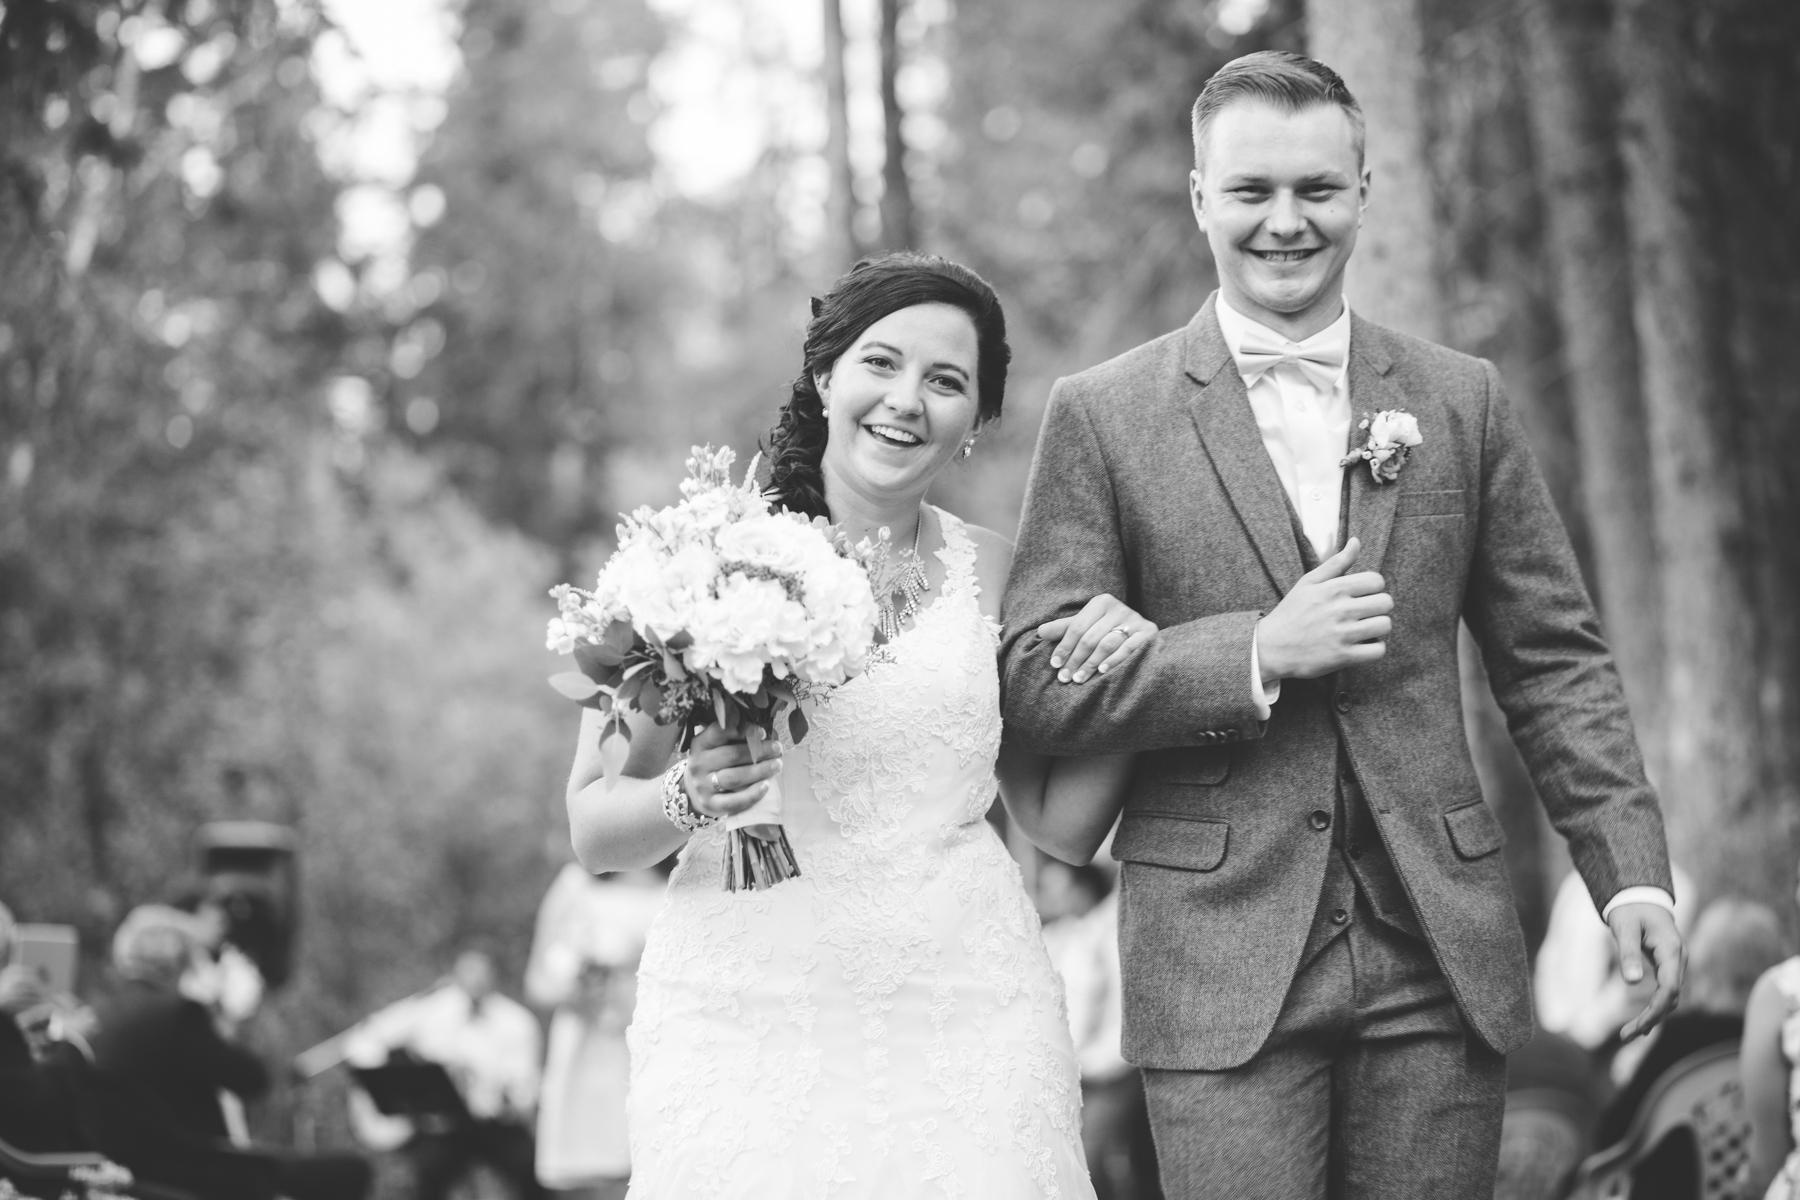 20150808-oglovewedding2-339.jpg